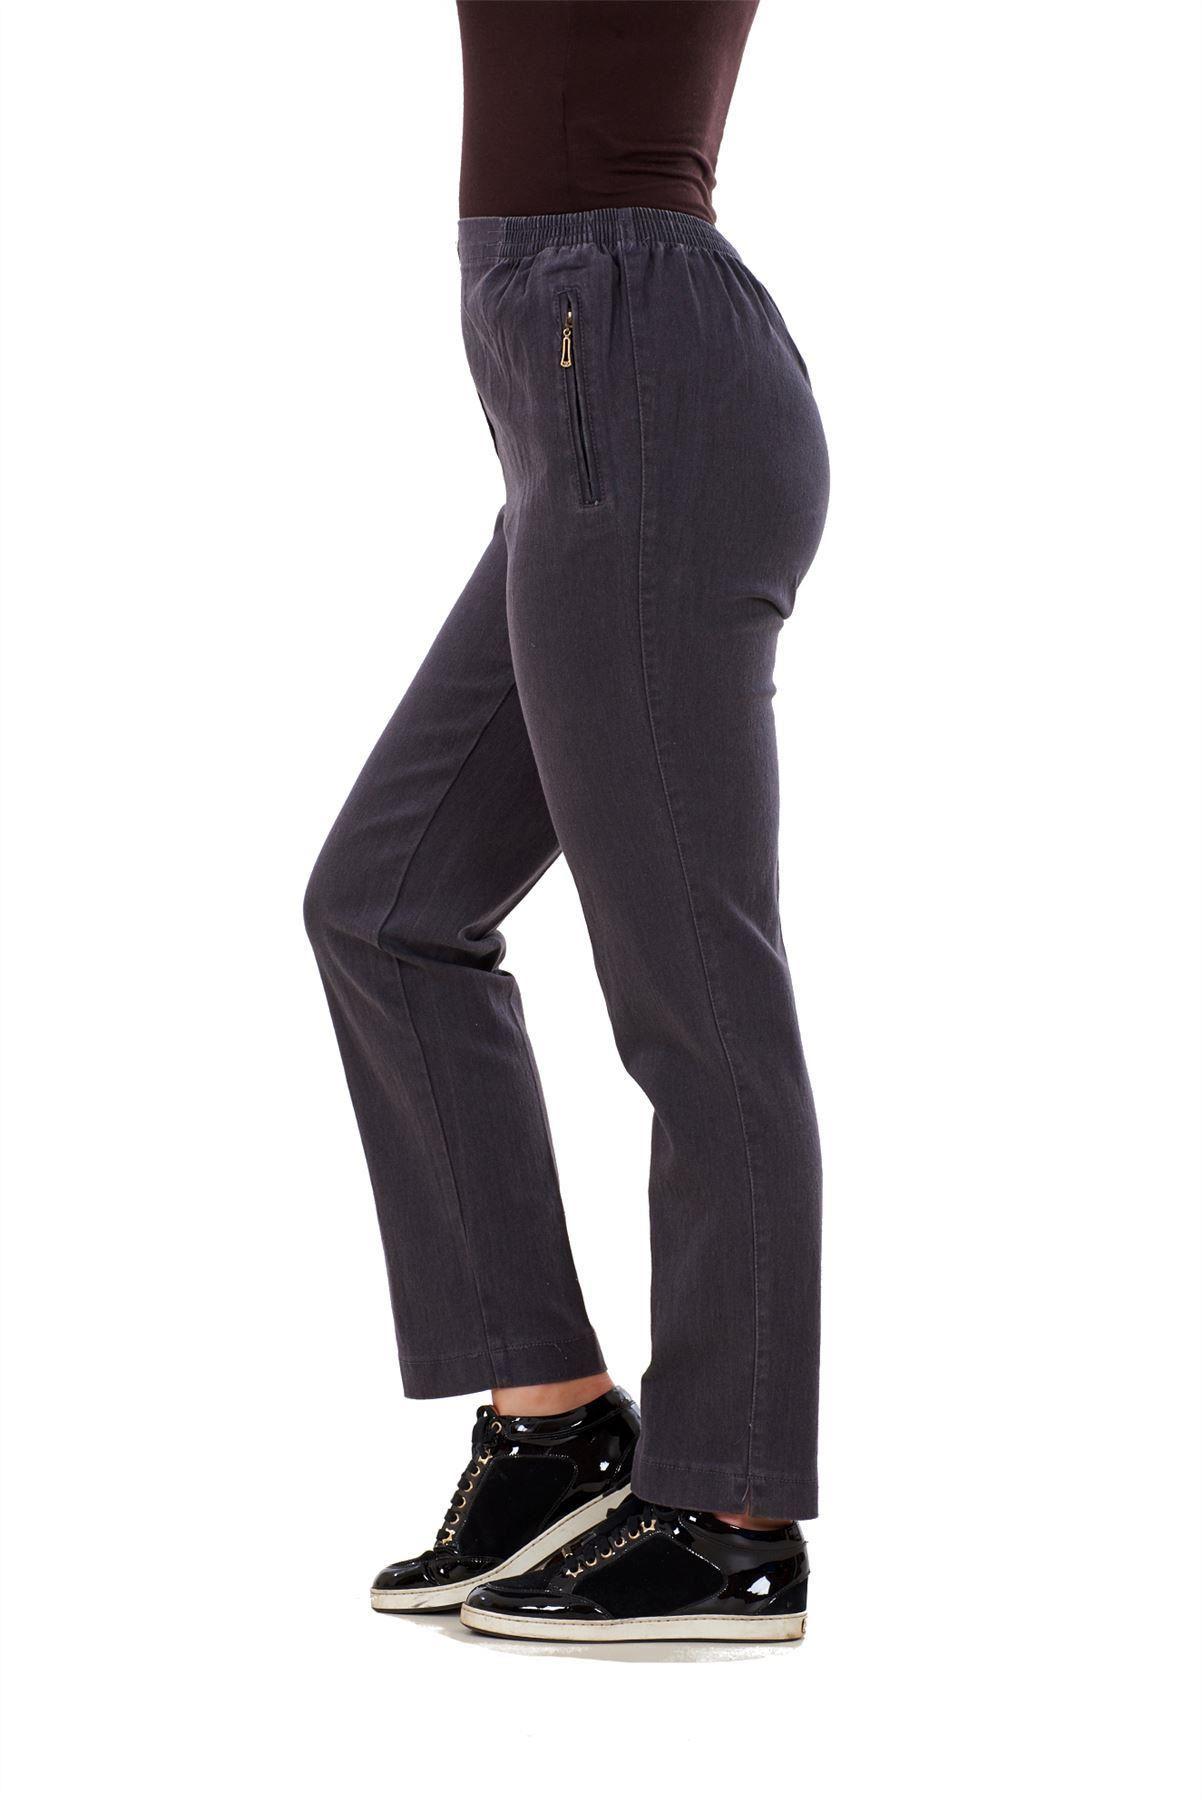 Ladies-Women-Trousers-Rayon-Cotton-Pockets-Elasticated-Stretch-Black-pants-8-24 thumbnail 10